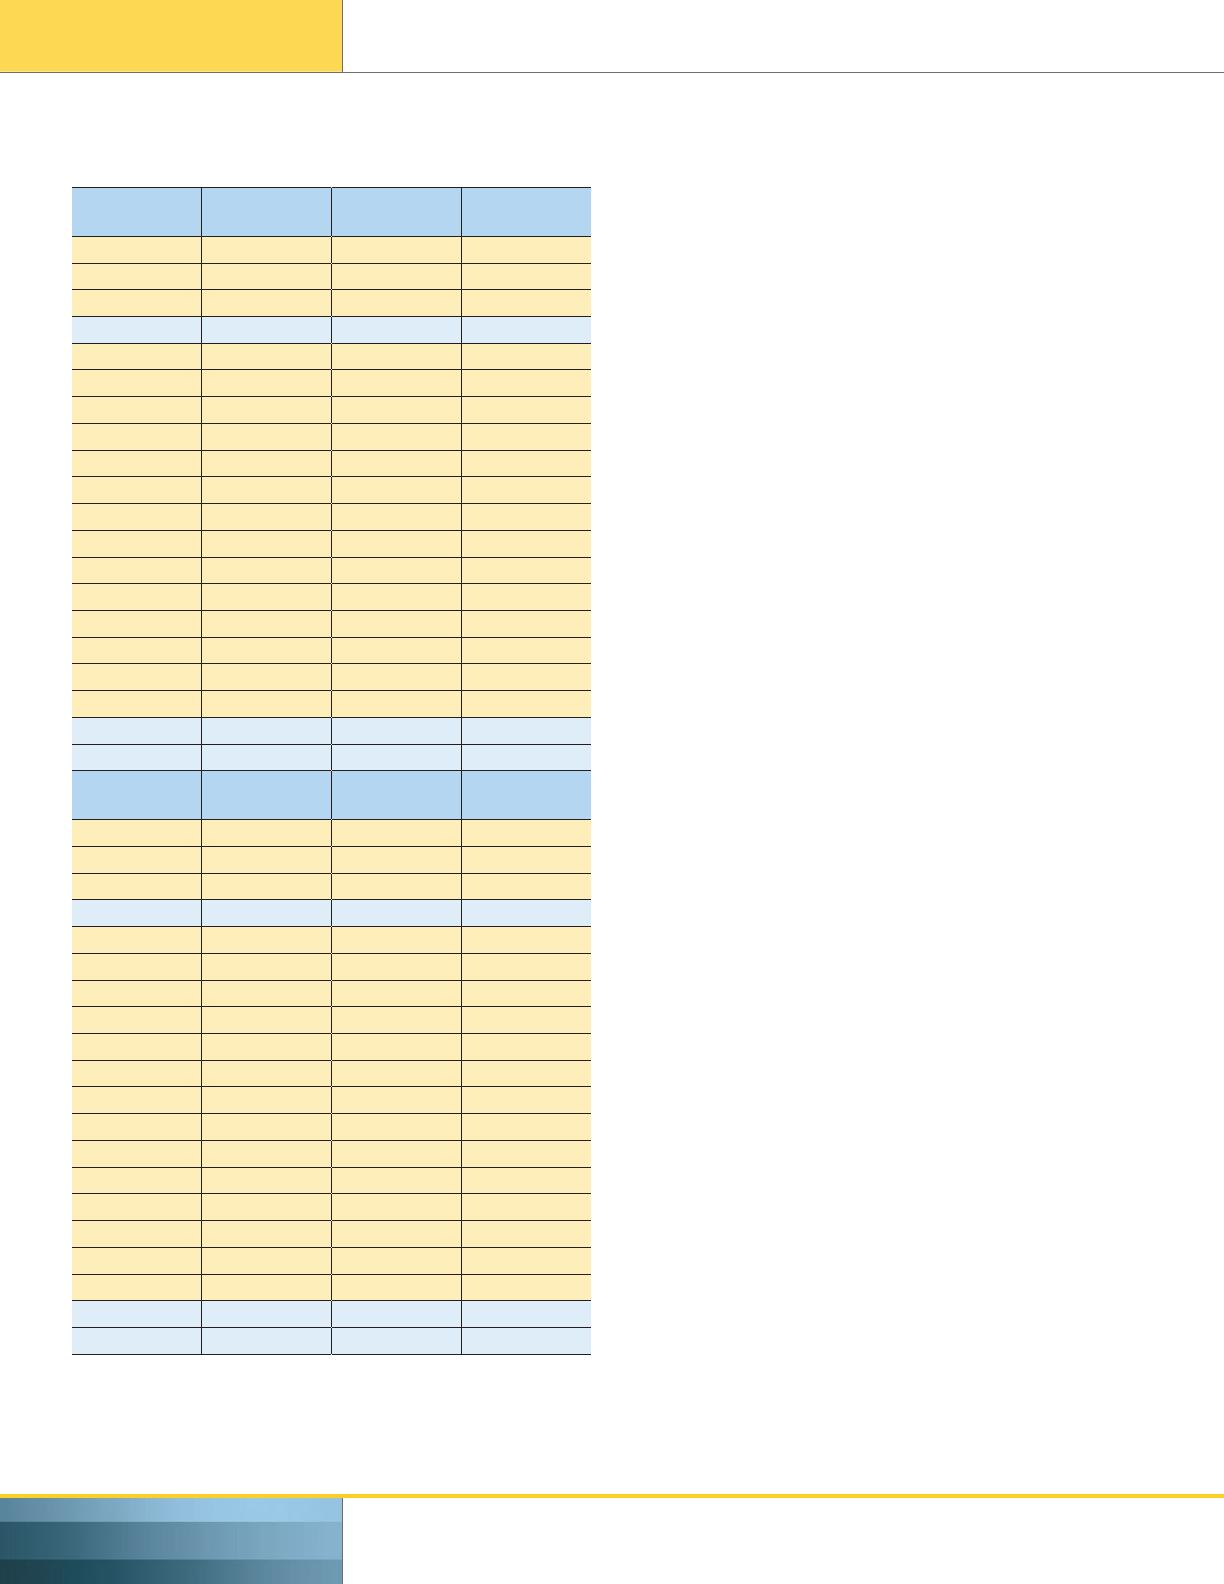 2013 Data 4735 812124